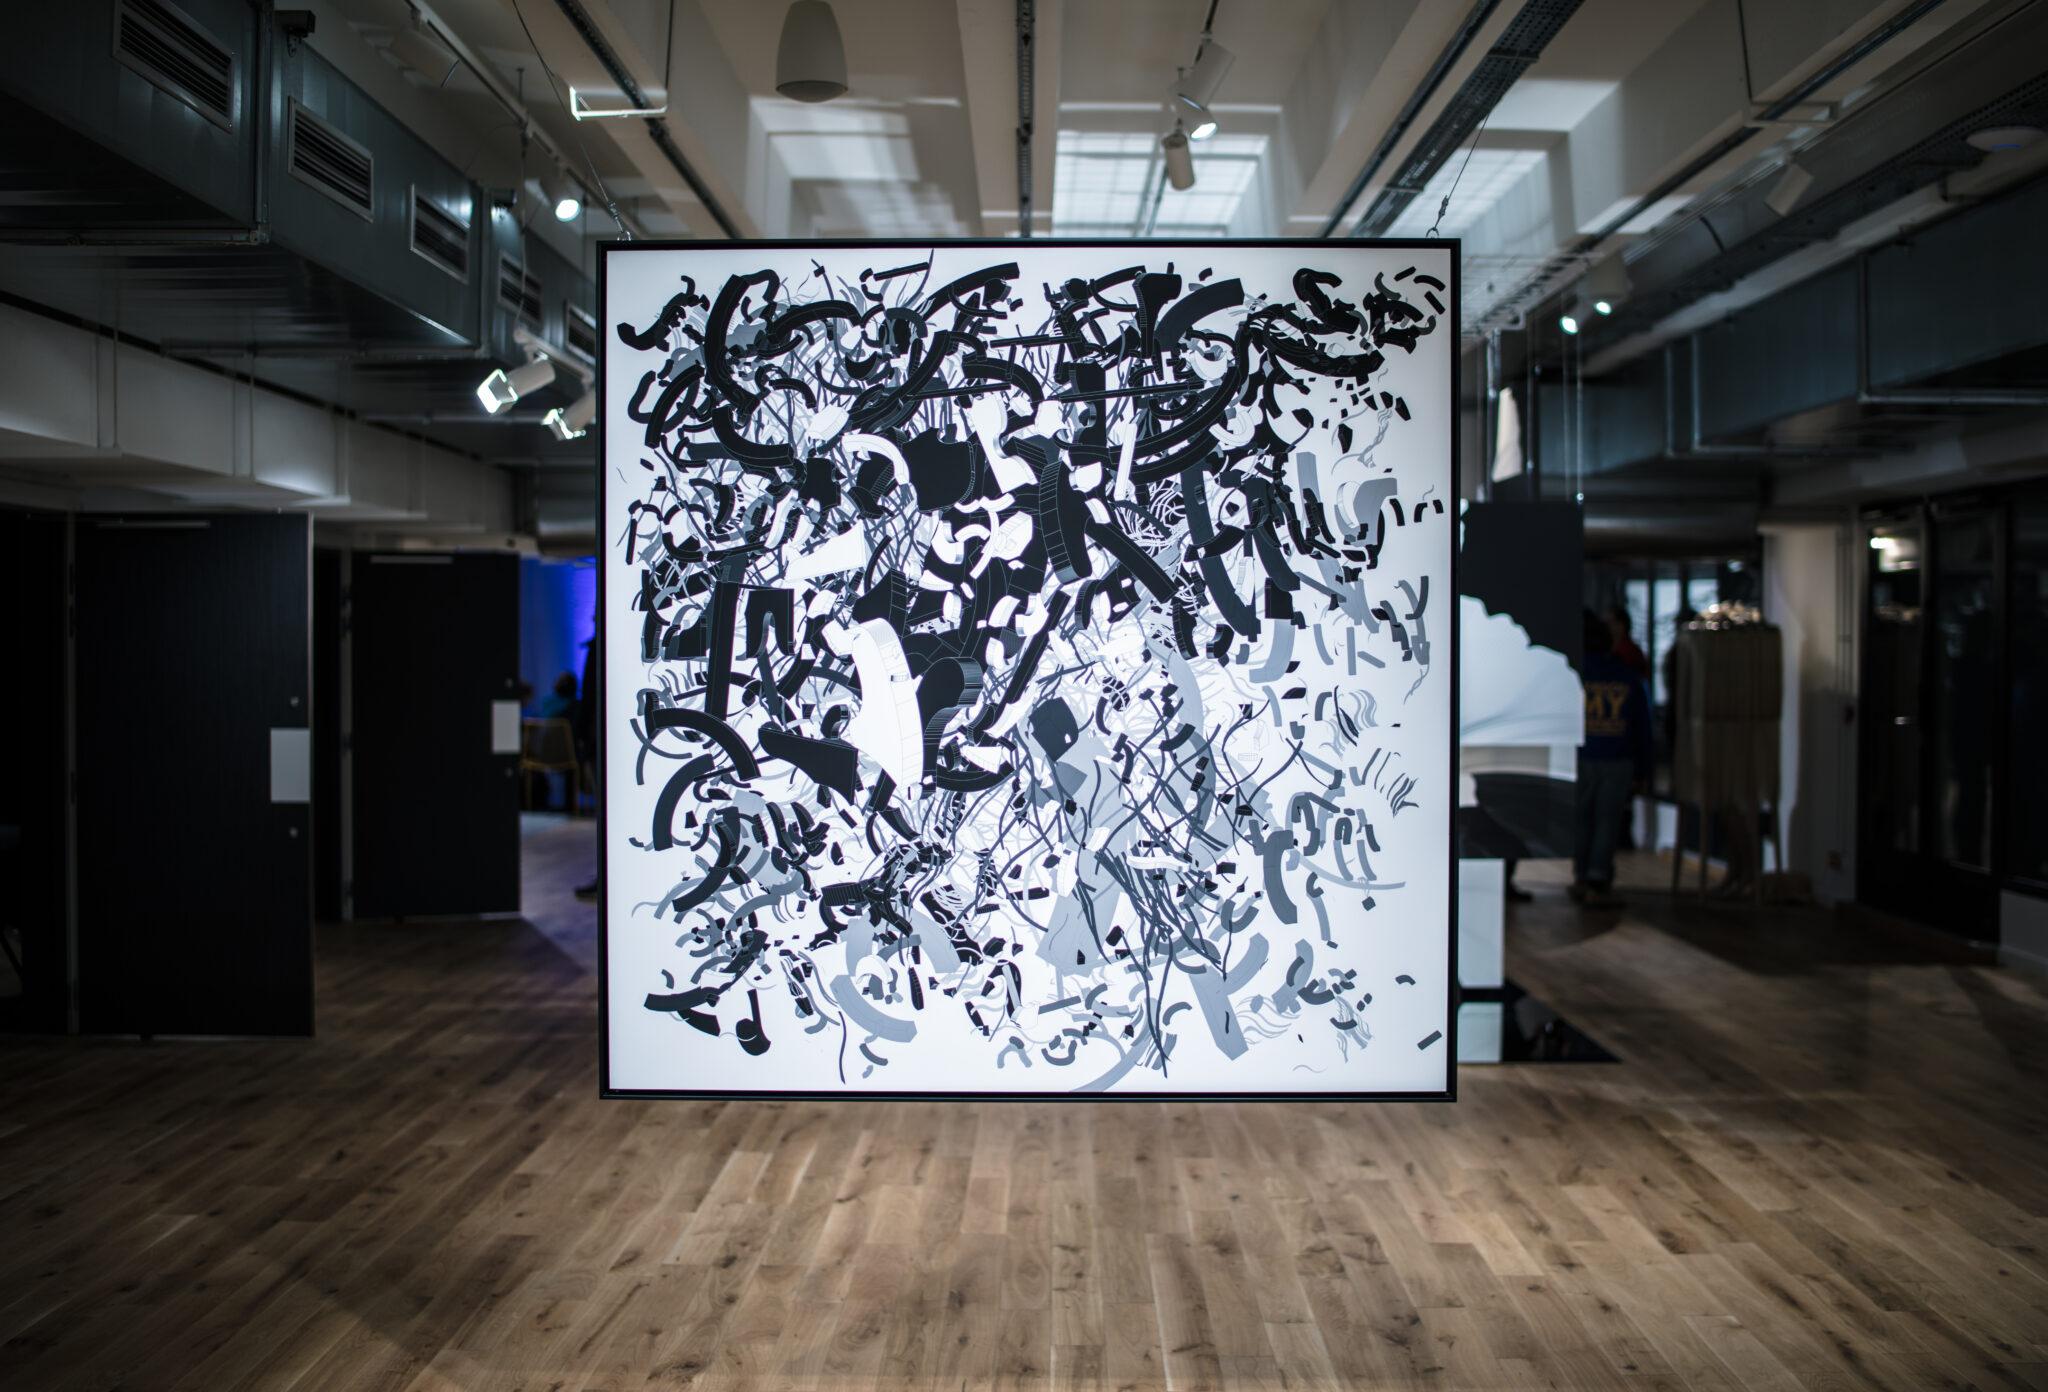 audrey-hatchikian-gallery-flagrant-délire-sacha-haillote-rodolphe-barsikian-duo-show-contemporary-art-expo